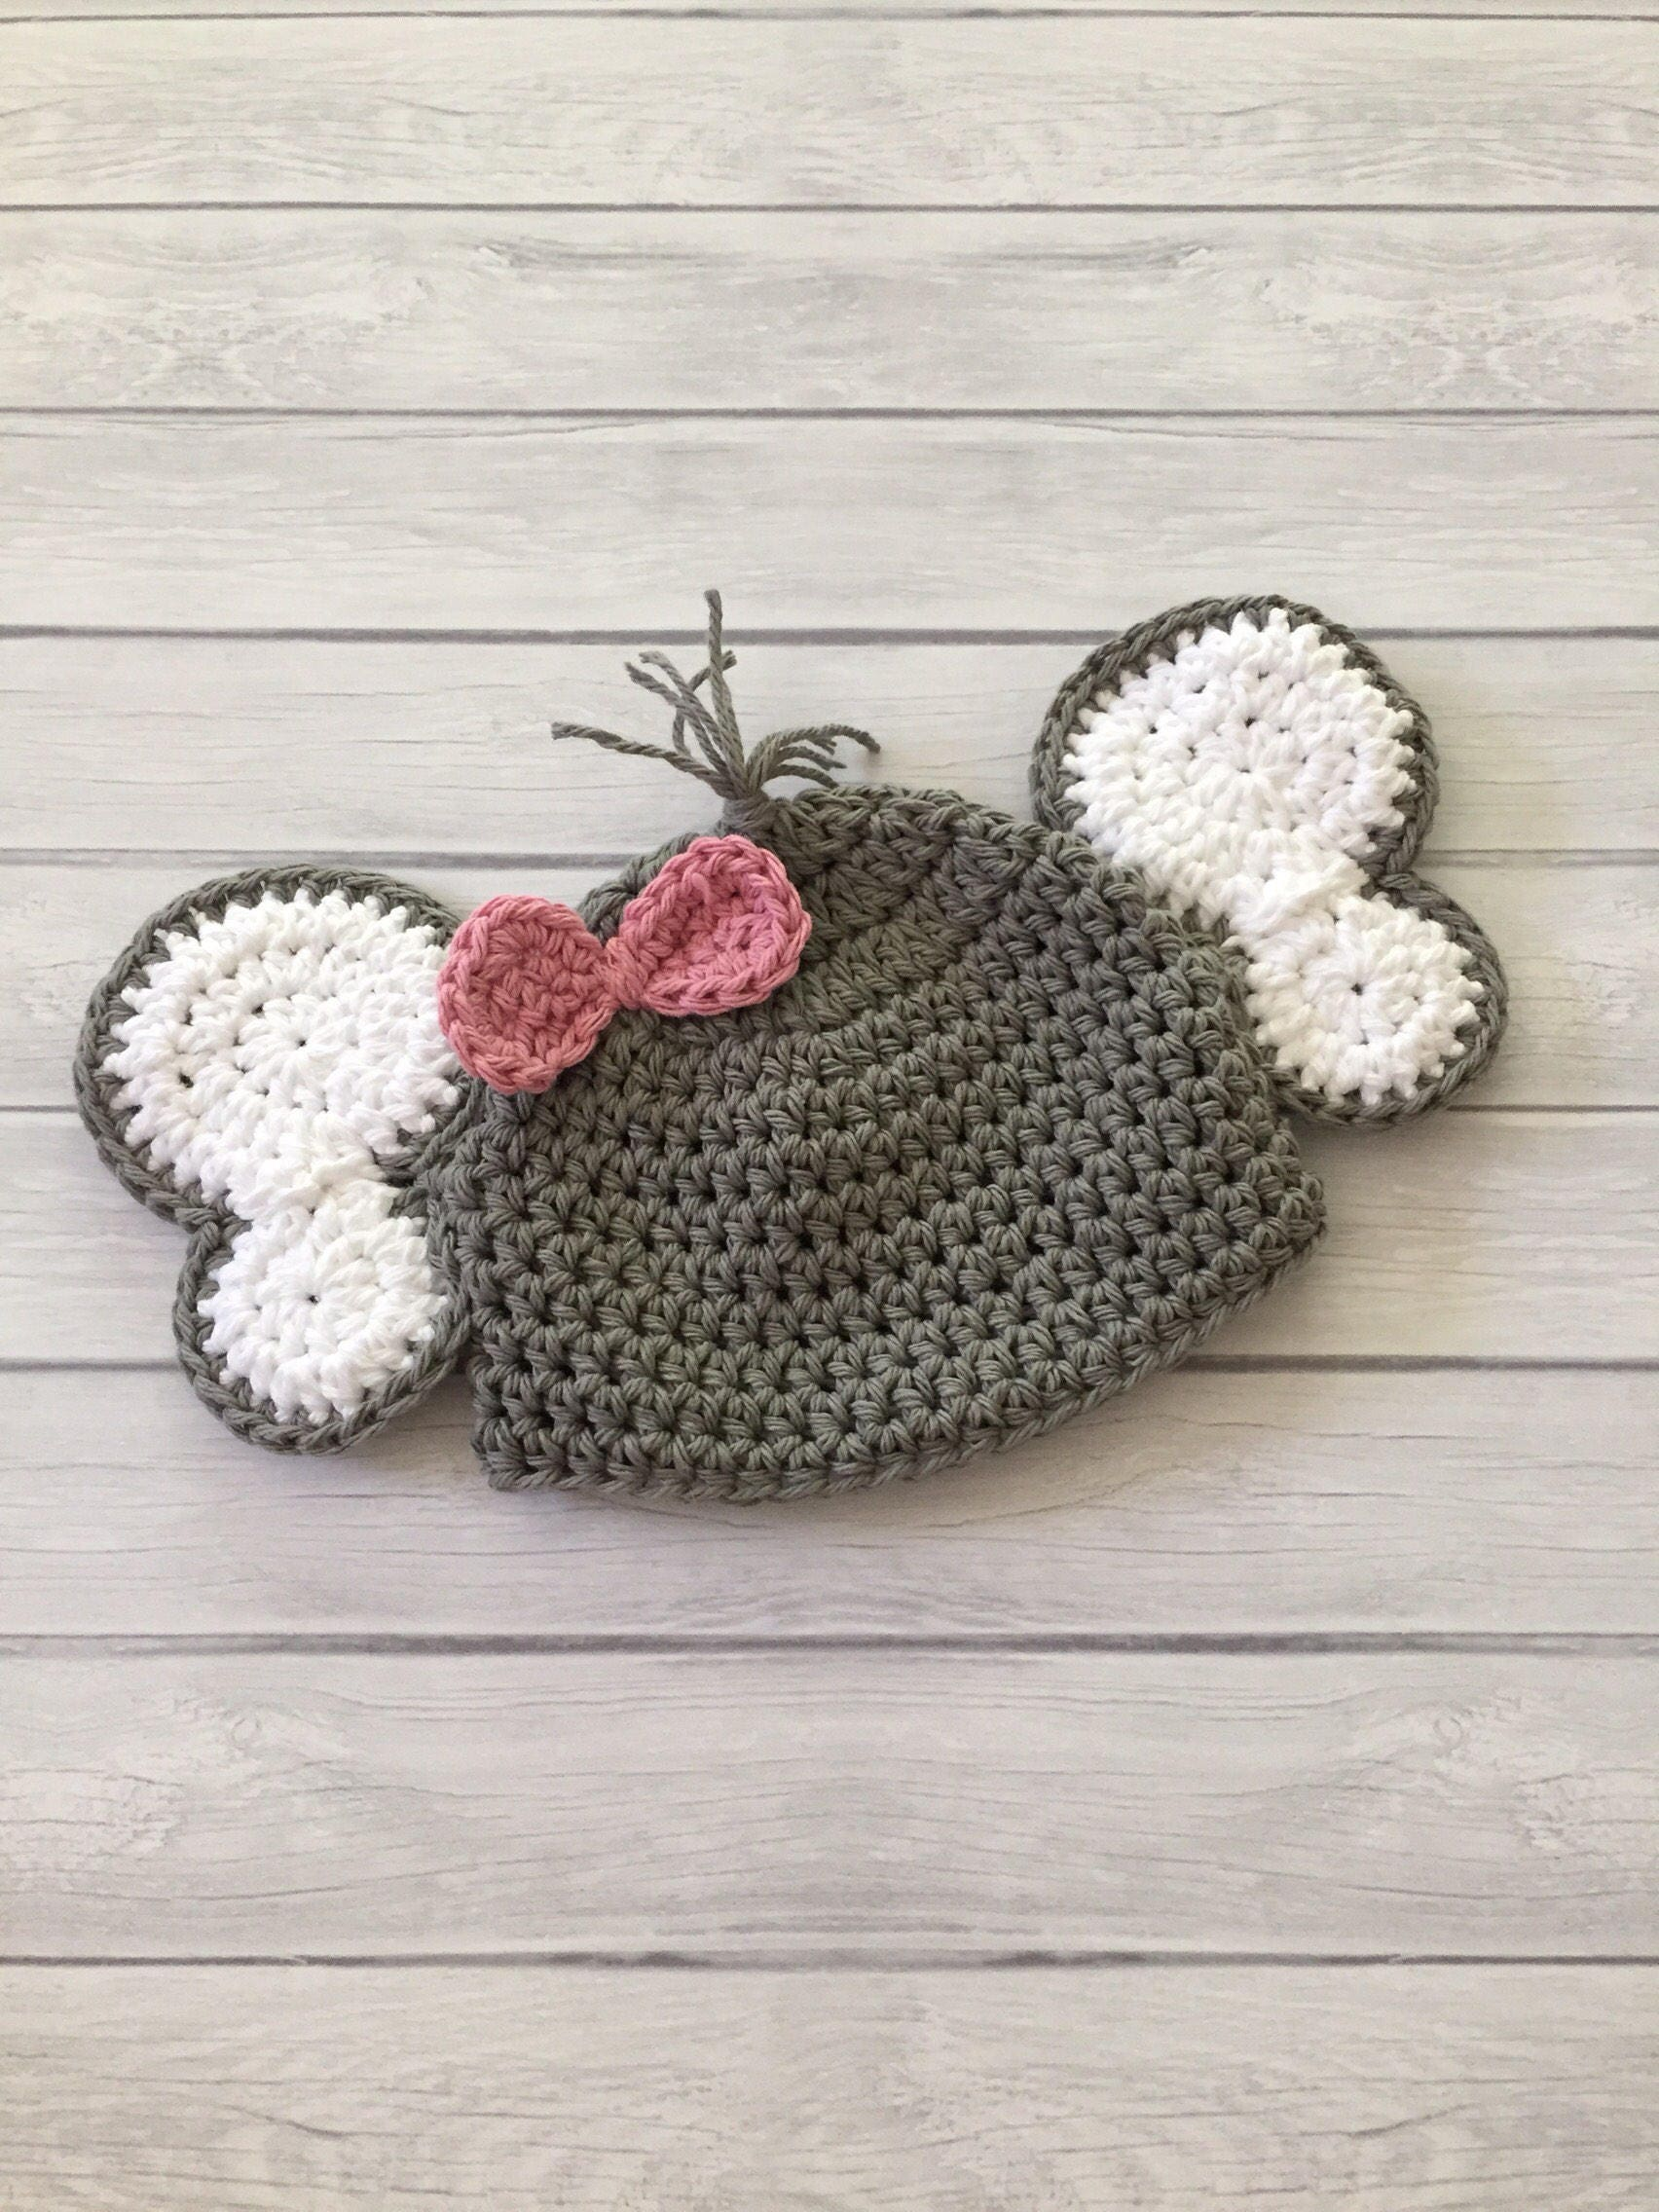 Elefant-Hut Baby-Elefant-Hut Elefant häkeln Elefant Hut